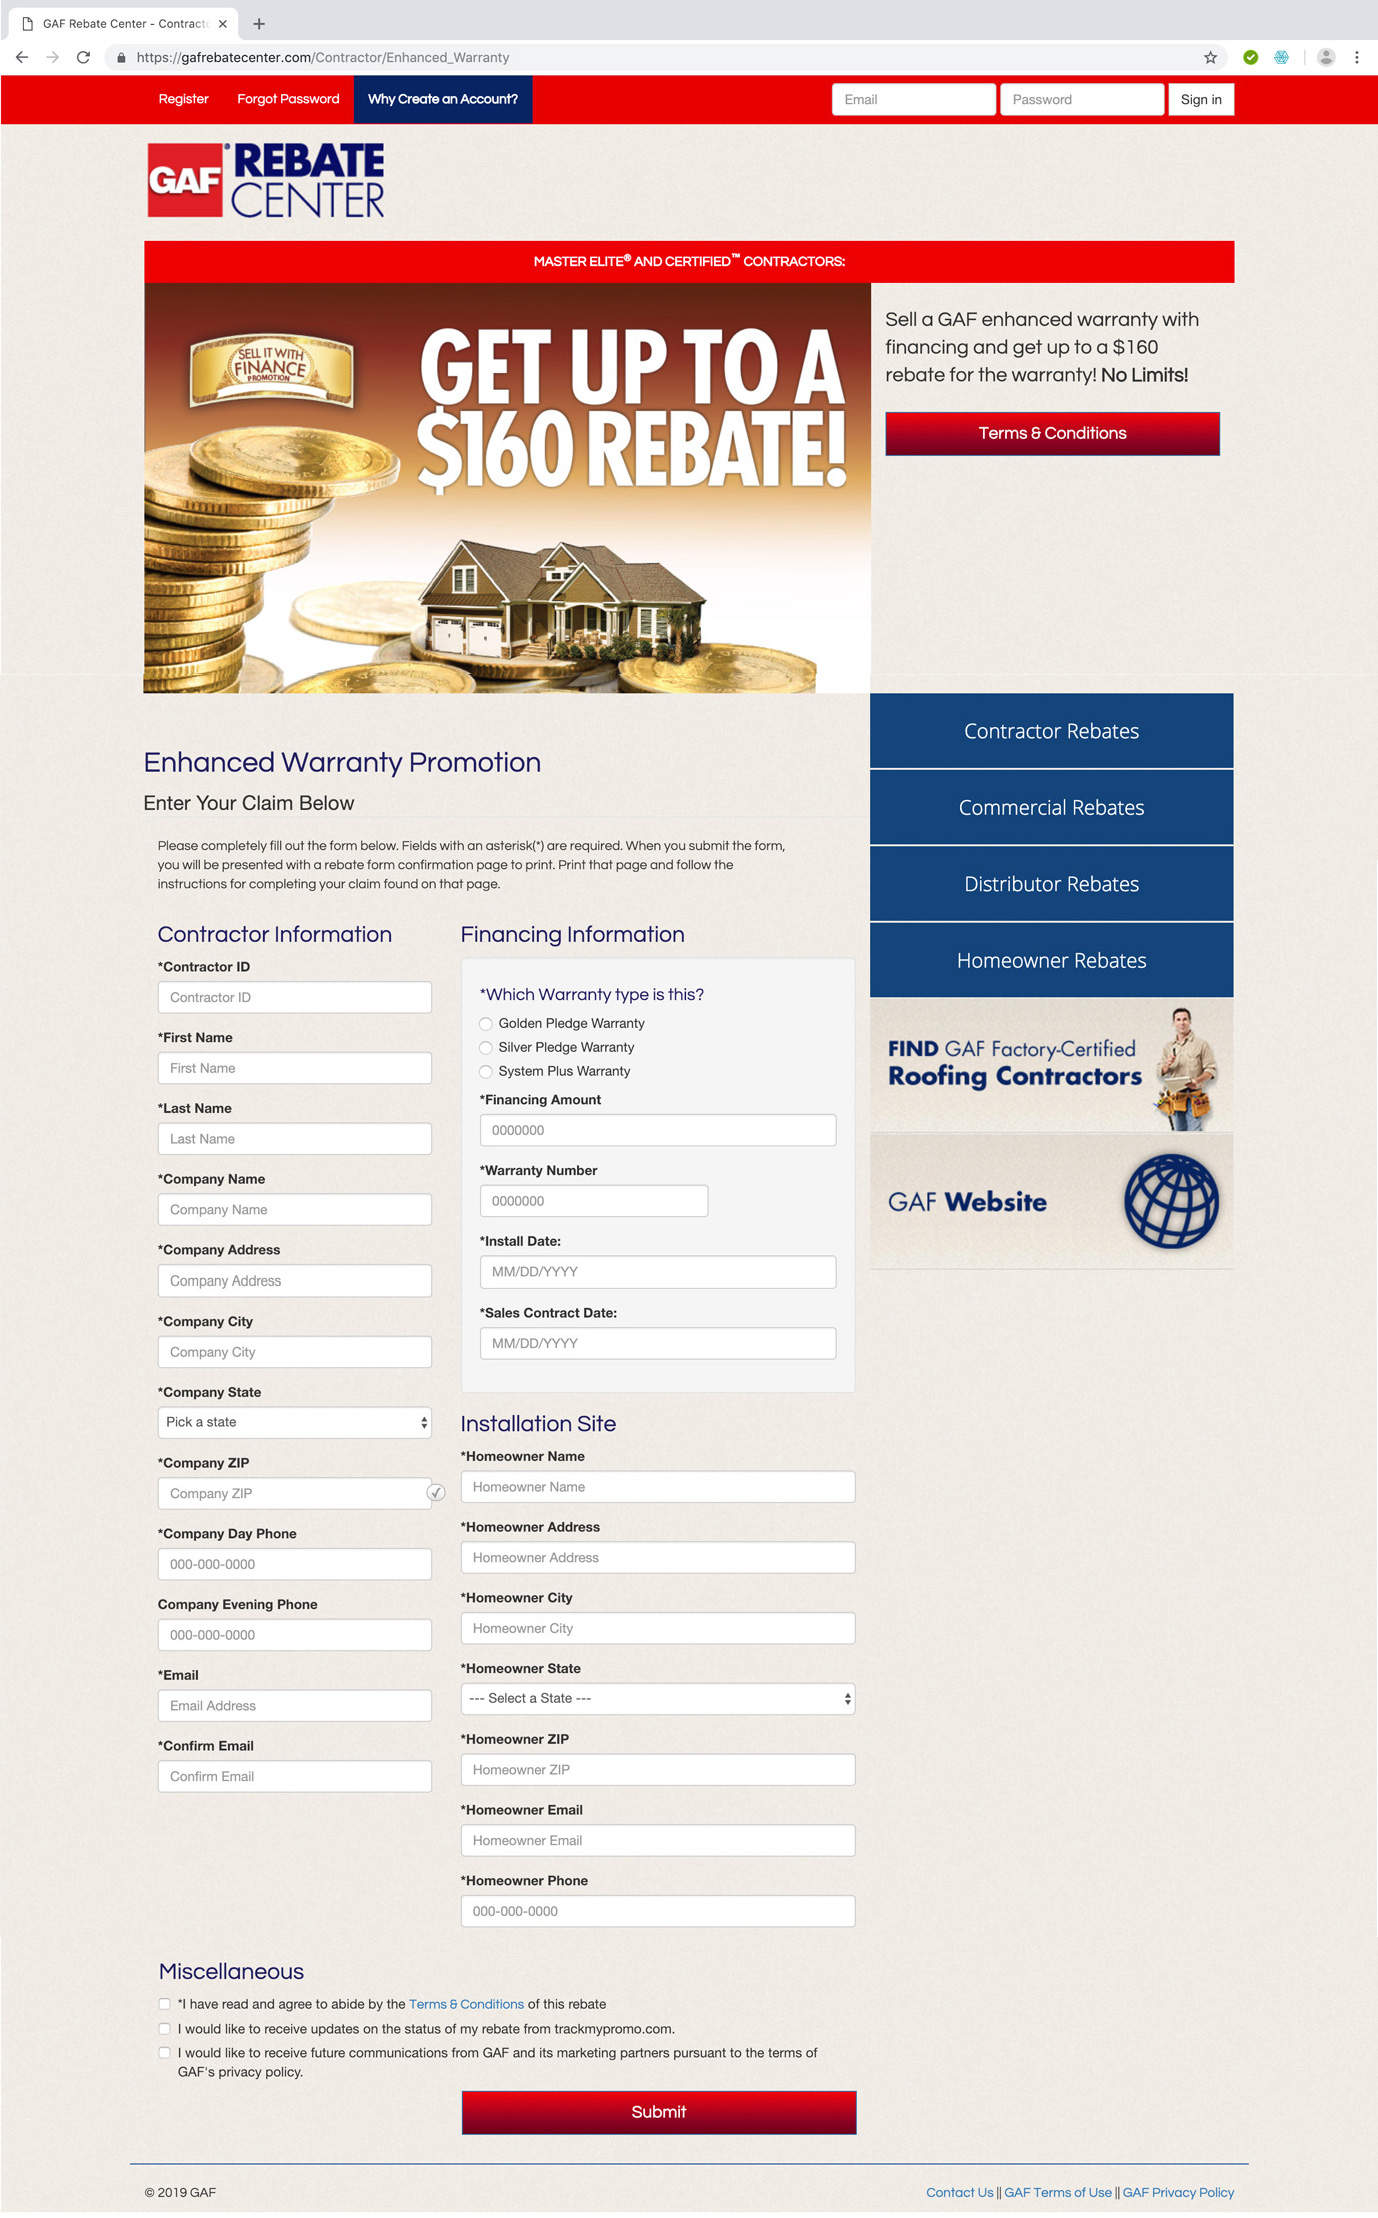 gaf-rebate-centre-rebate-offer